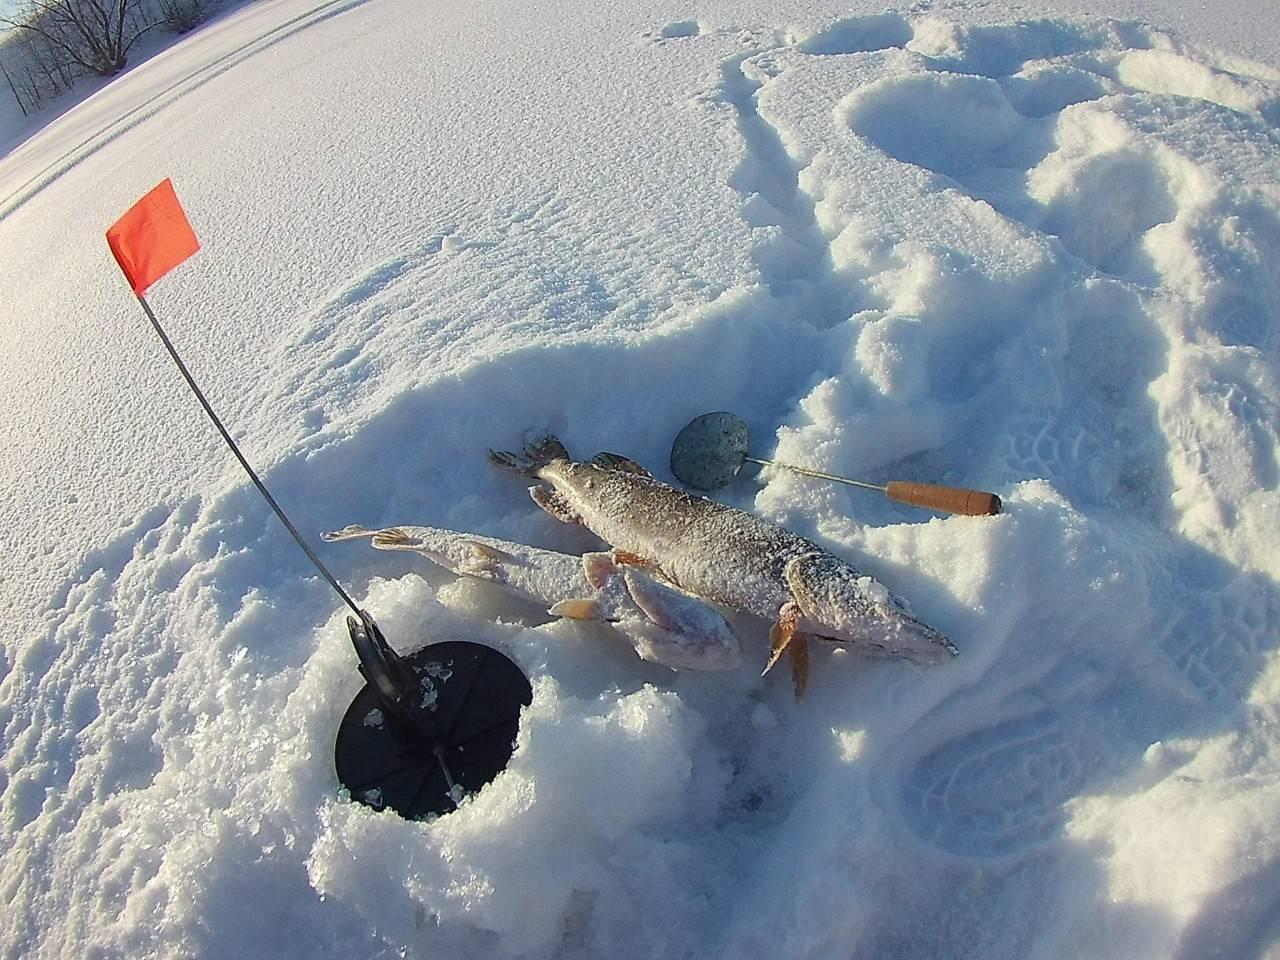 Ловля щуки на жерлицы зимой от а до я - читайте на сatcher.fish